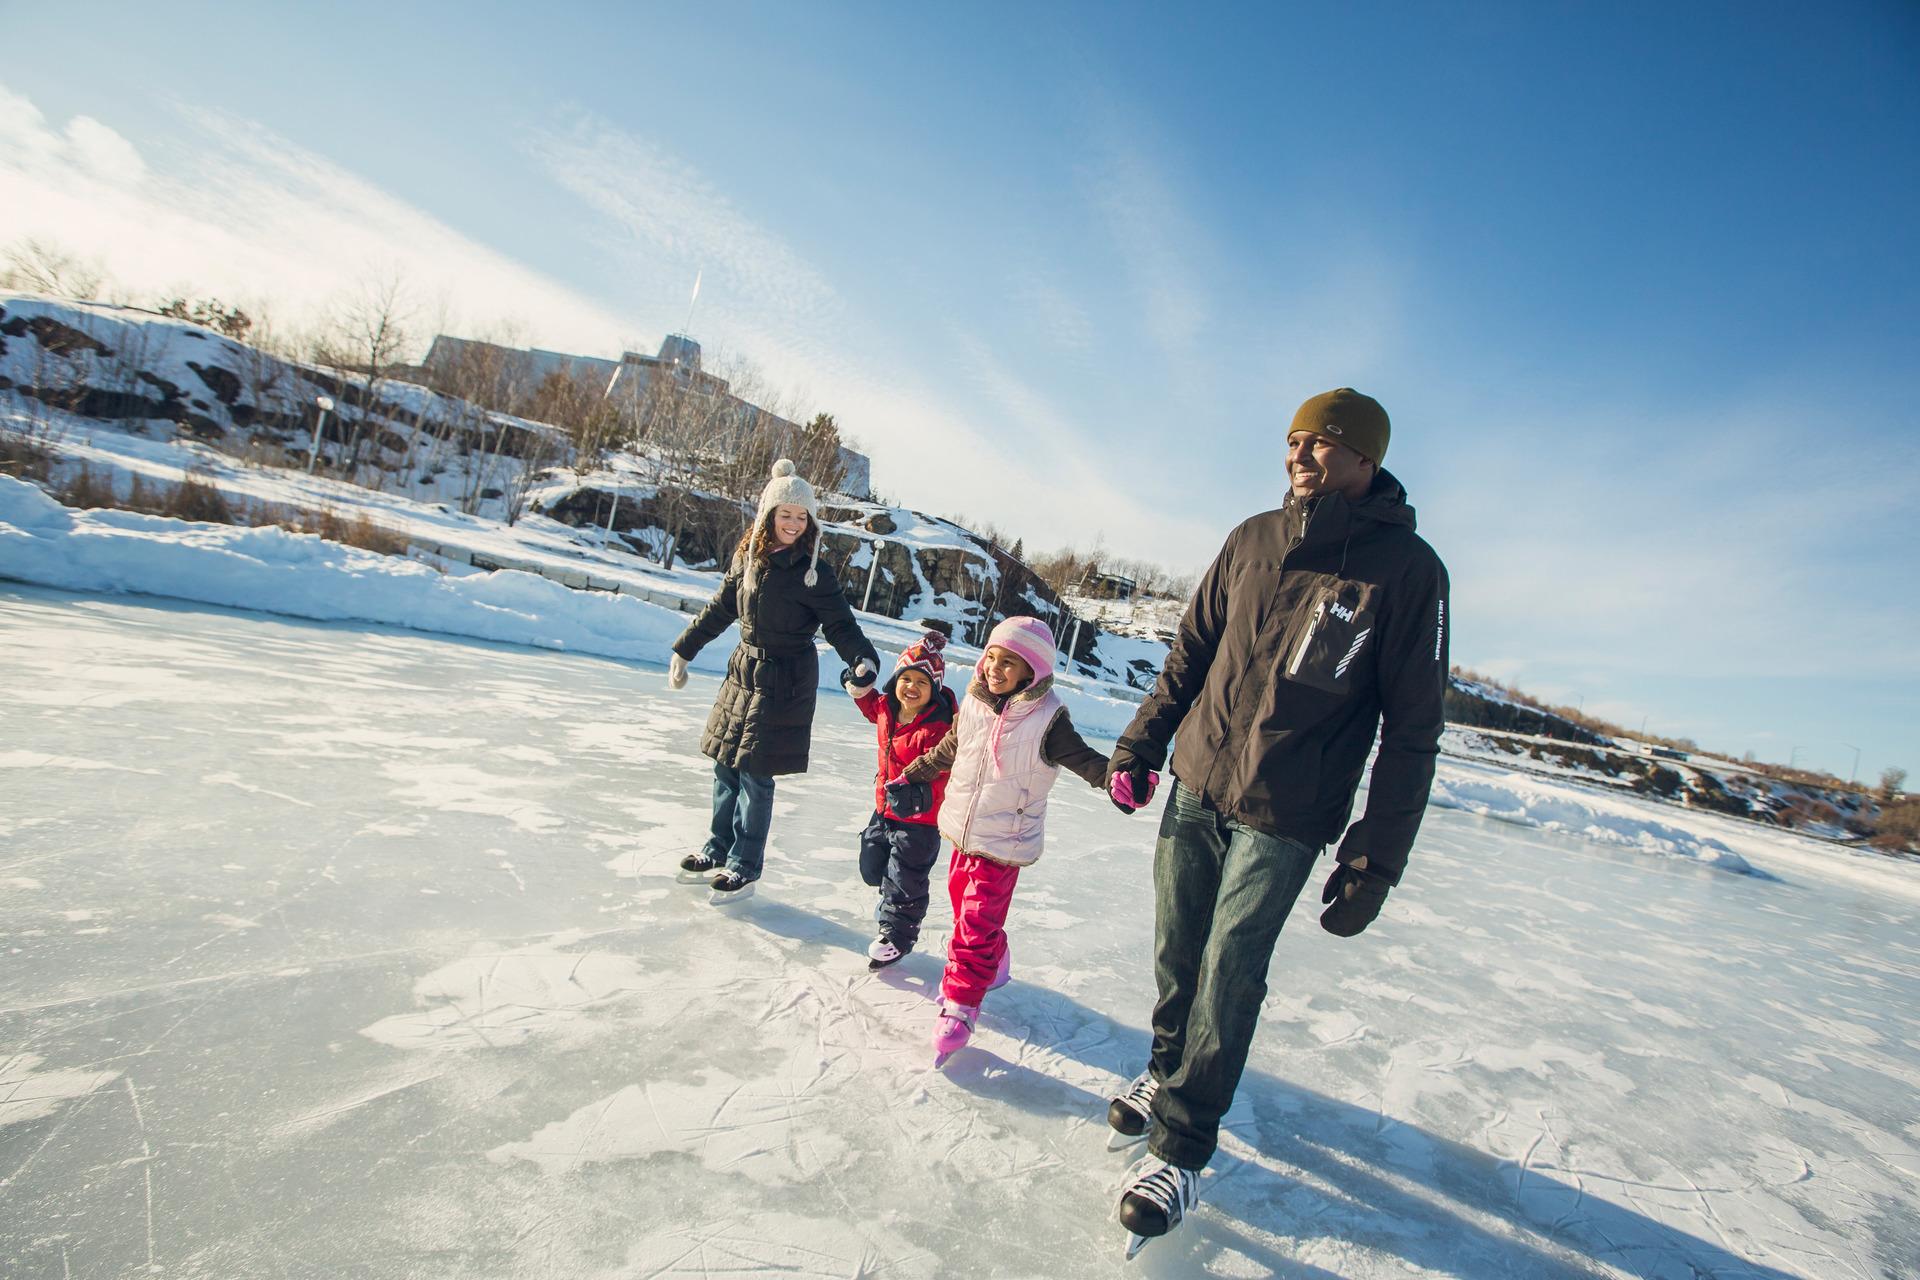 Top 5 Activities For Big Fun This Winter